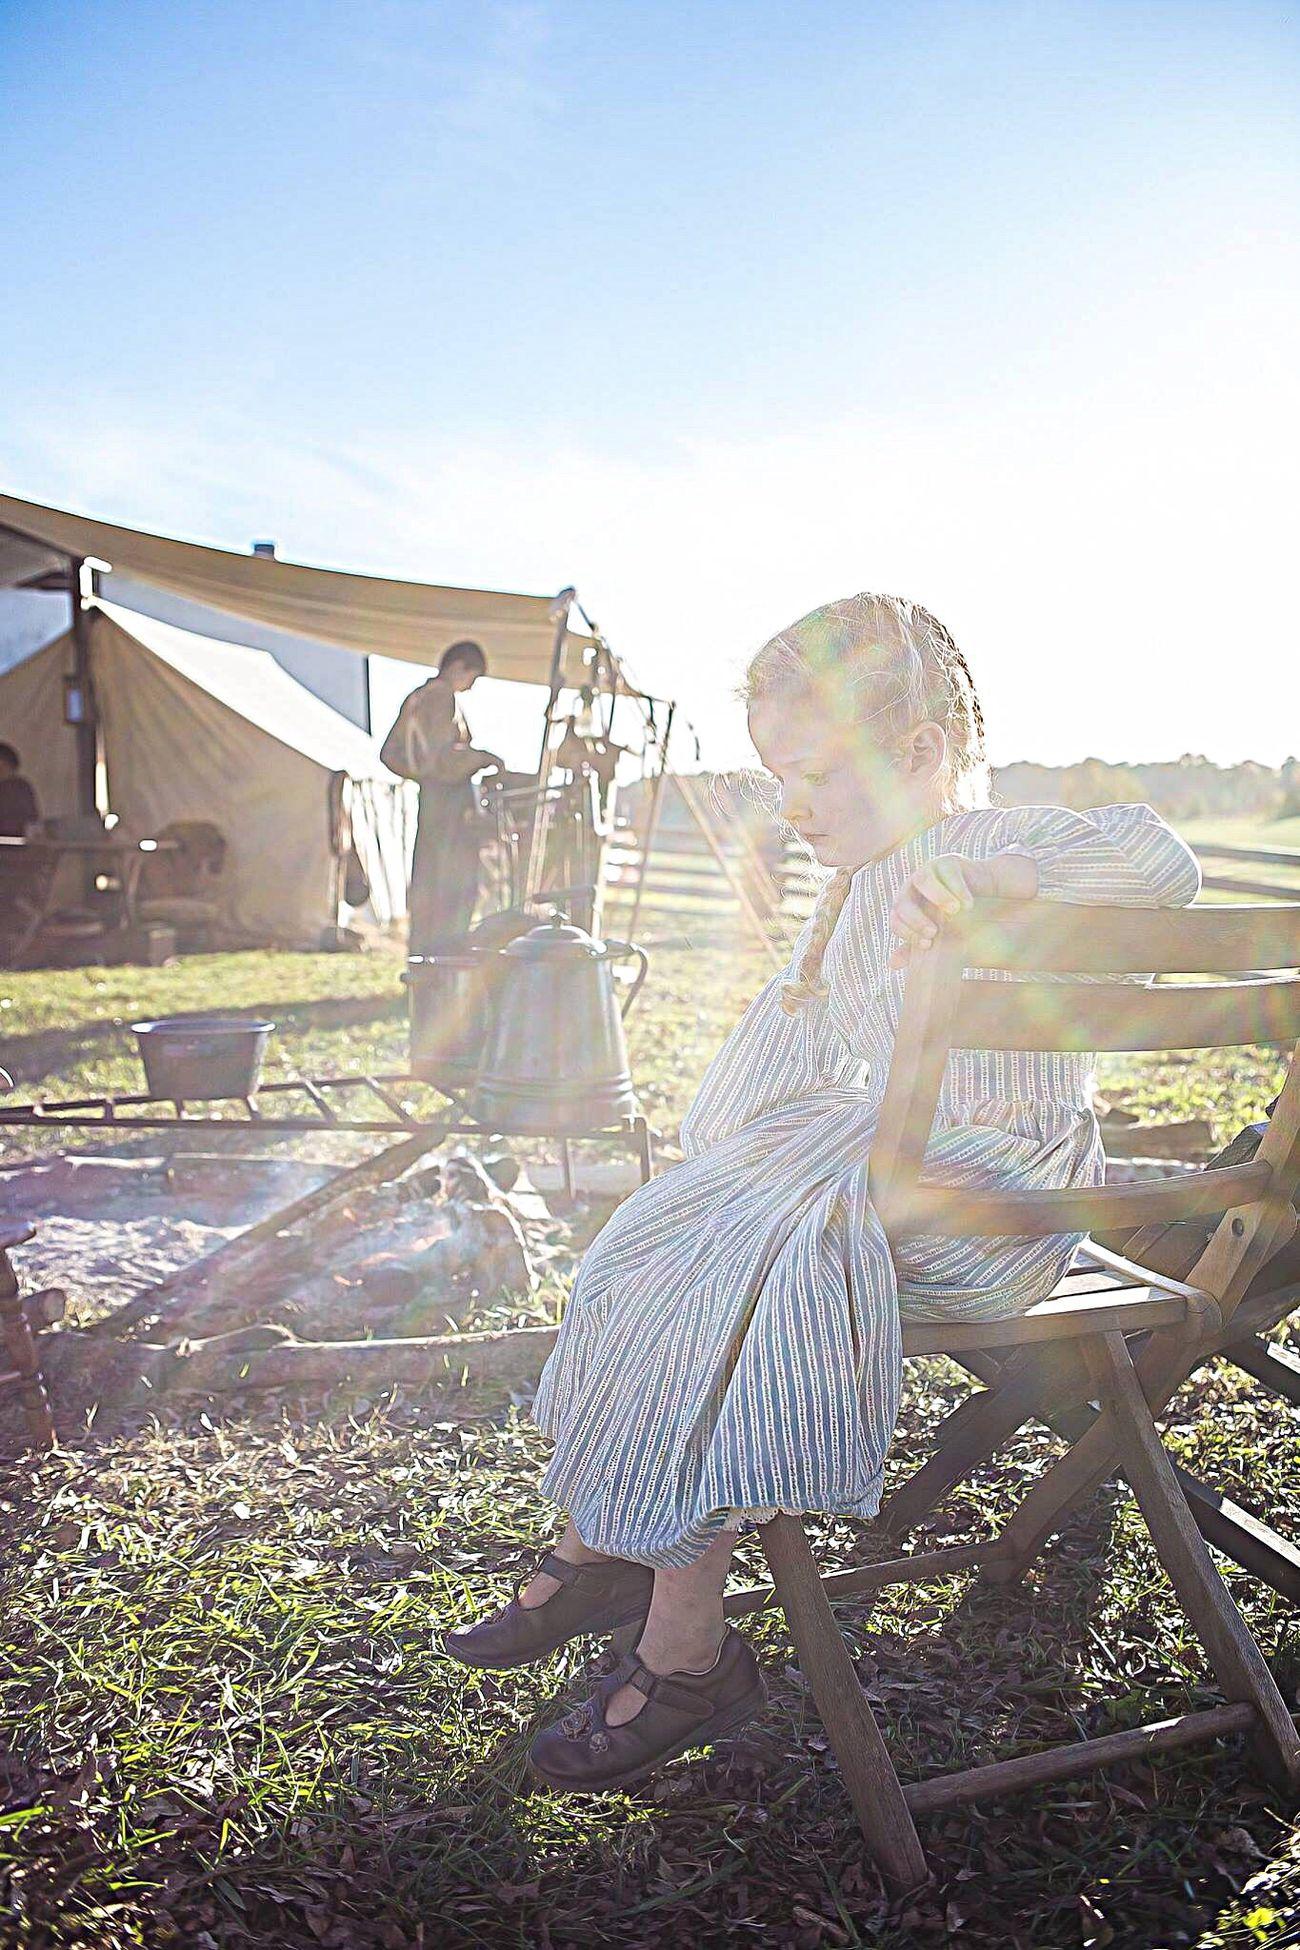 Historical Reenactment Atlanta, Georgia Battle Reenactment Reenactors Nashfarm Oaktreeshutterbug Tomate_pauline